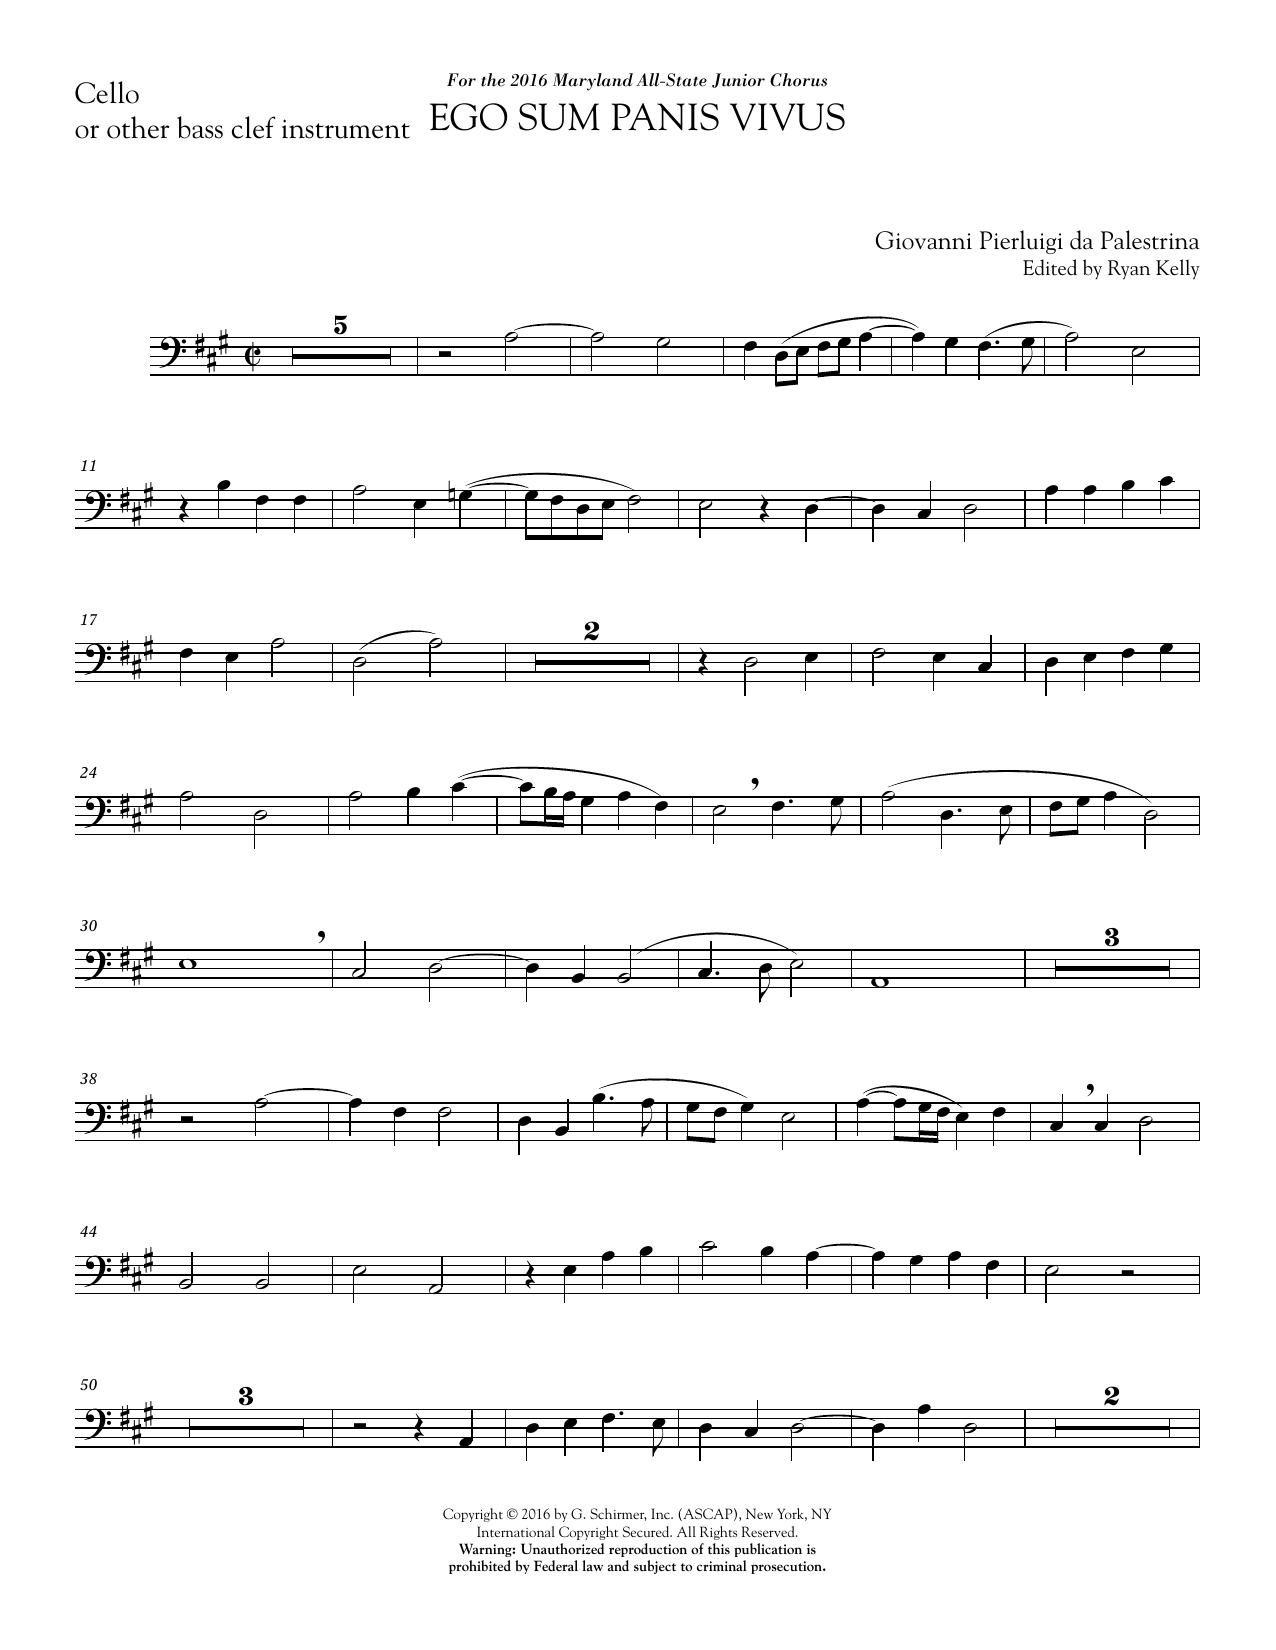 Ego sum panis vivus (ed. Ryan Kelly) - Cello Sheet Music